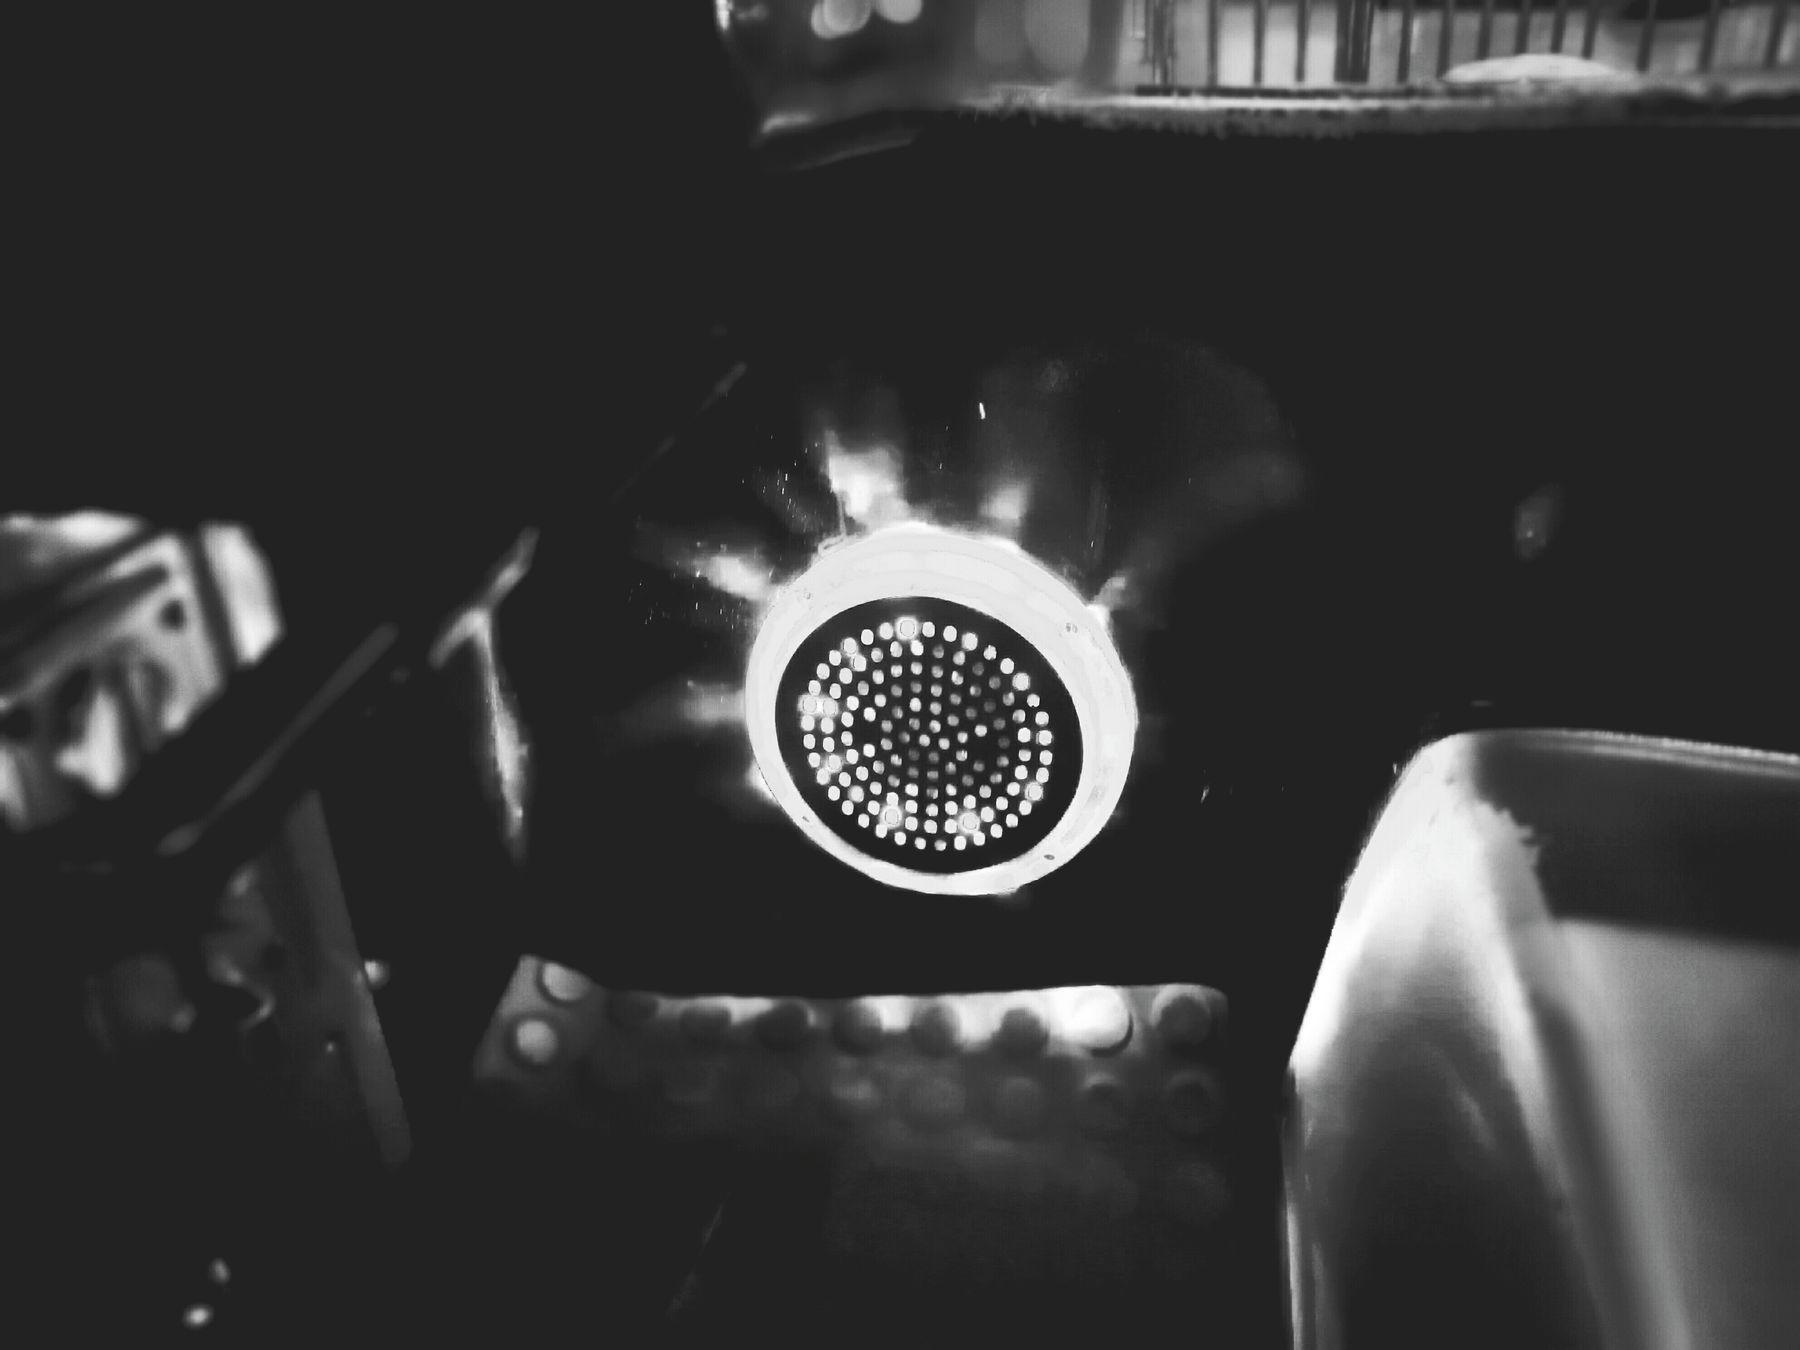 Monochrome Photography No People Neomarin Monocrome. Monocrome Black And White